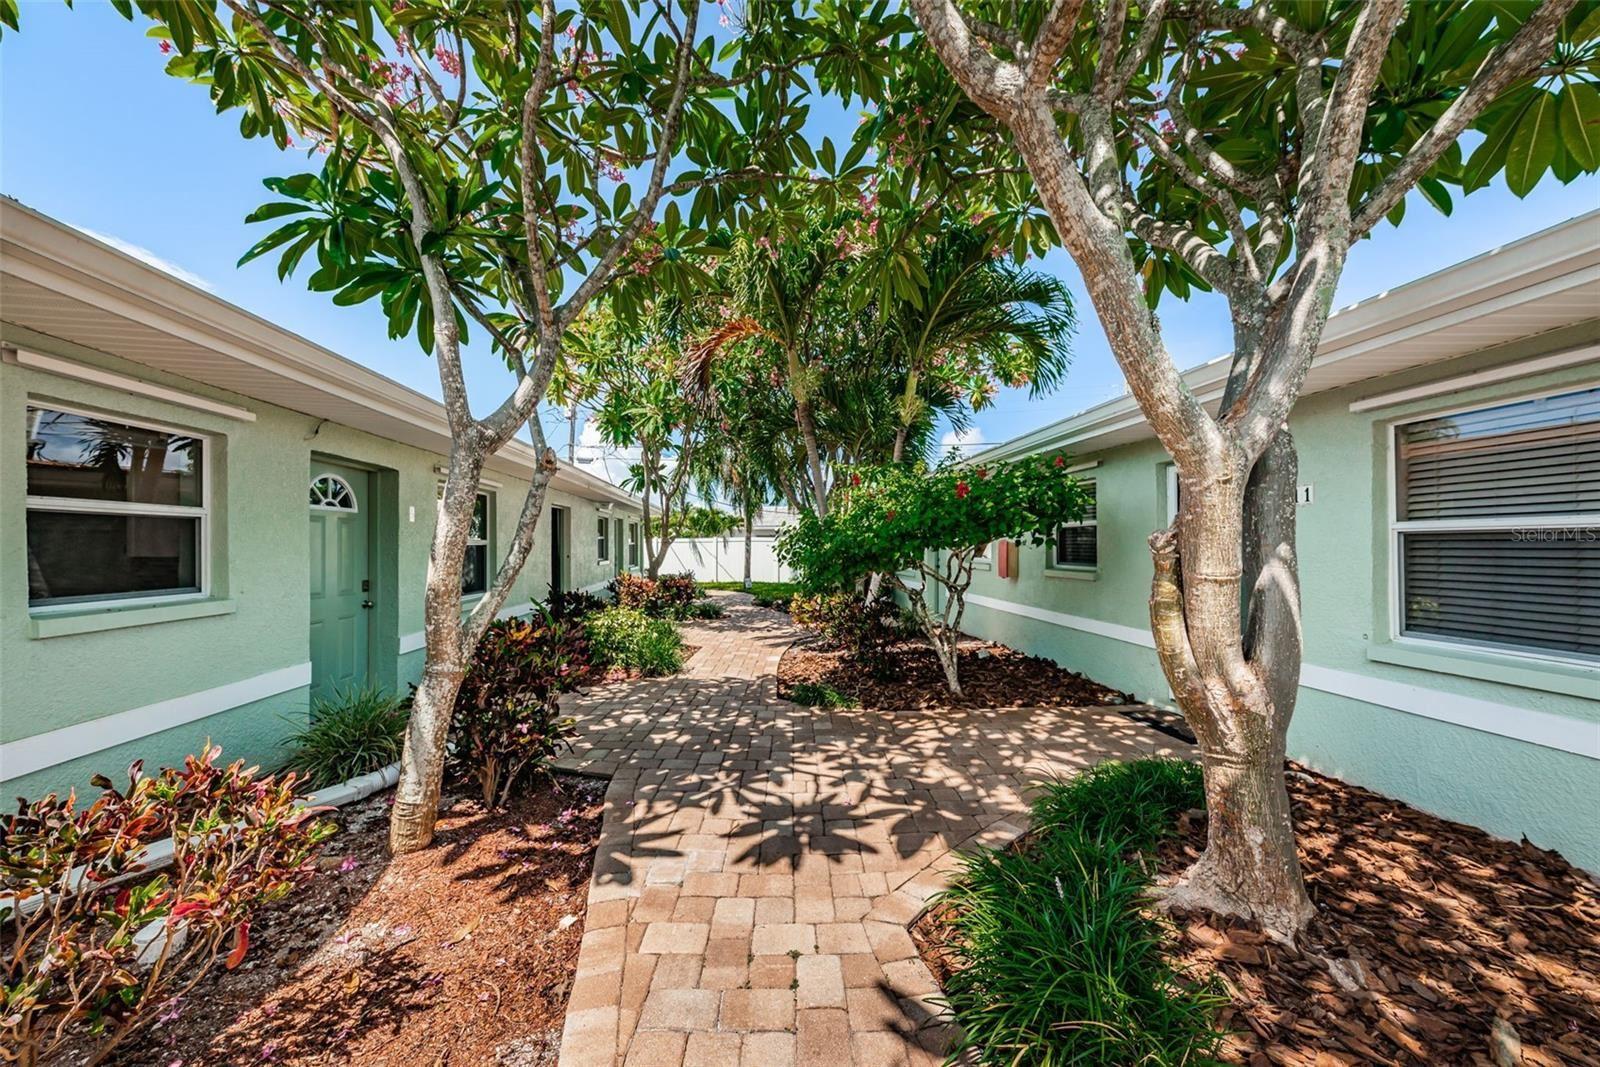 9040 BLIND PASS ROAD #B5, Saint Pete Beach, FL 33706 - #: U8131225